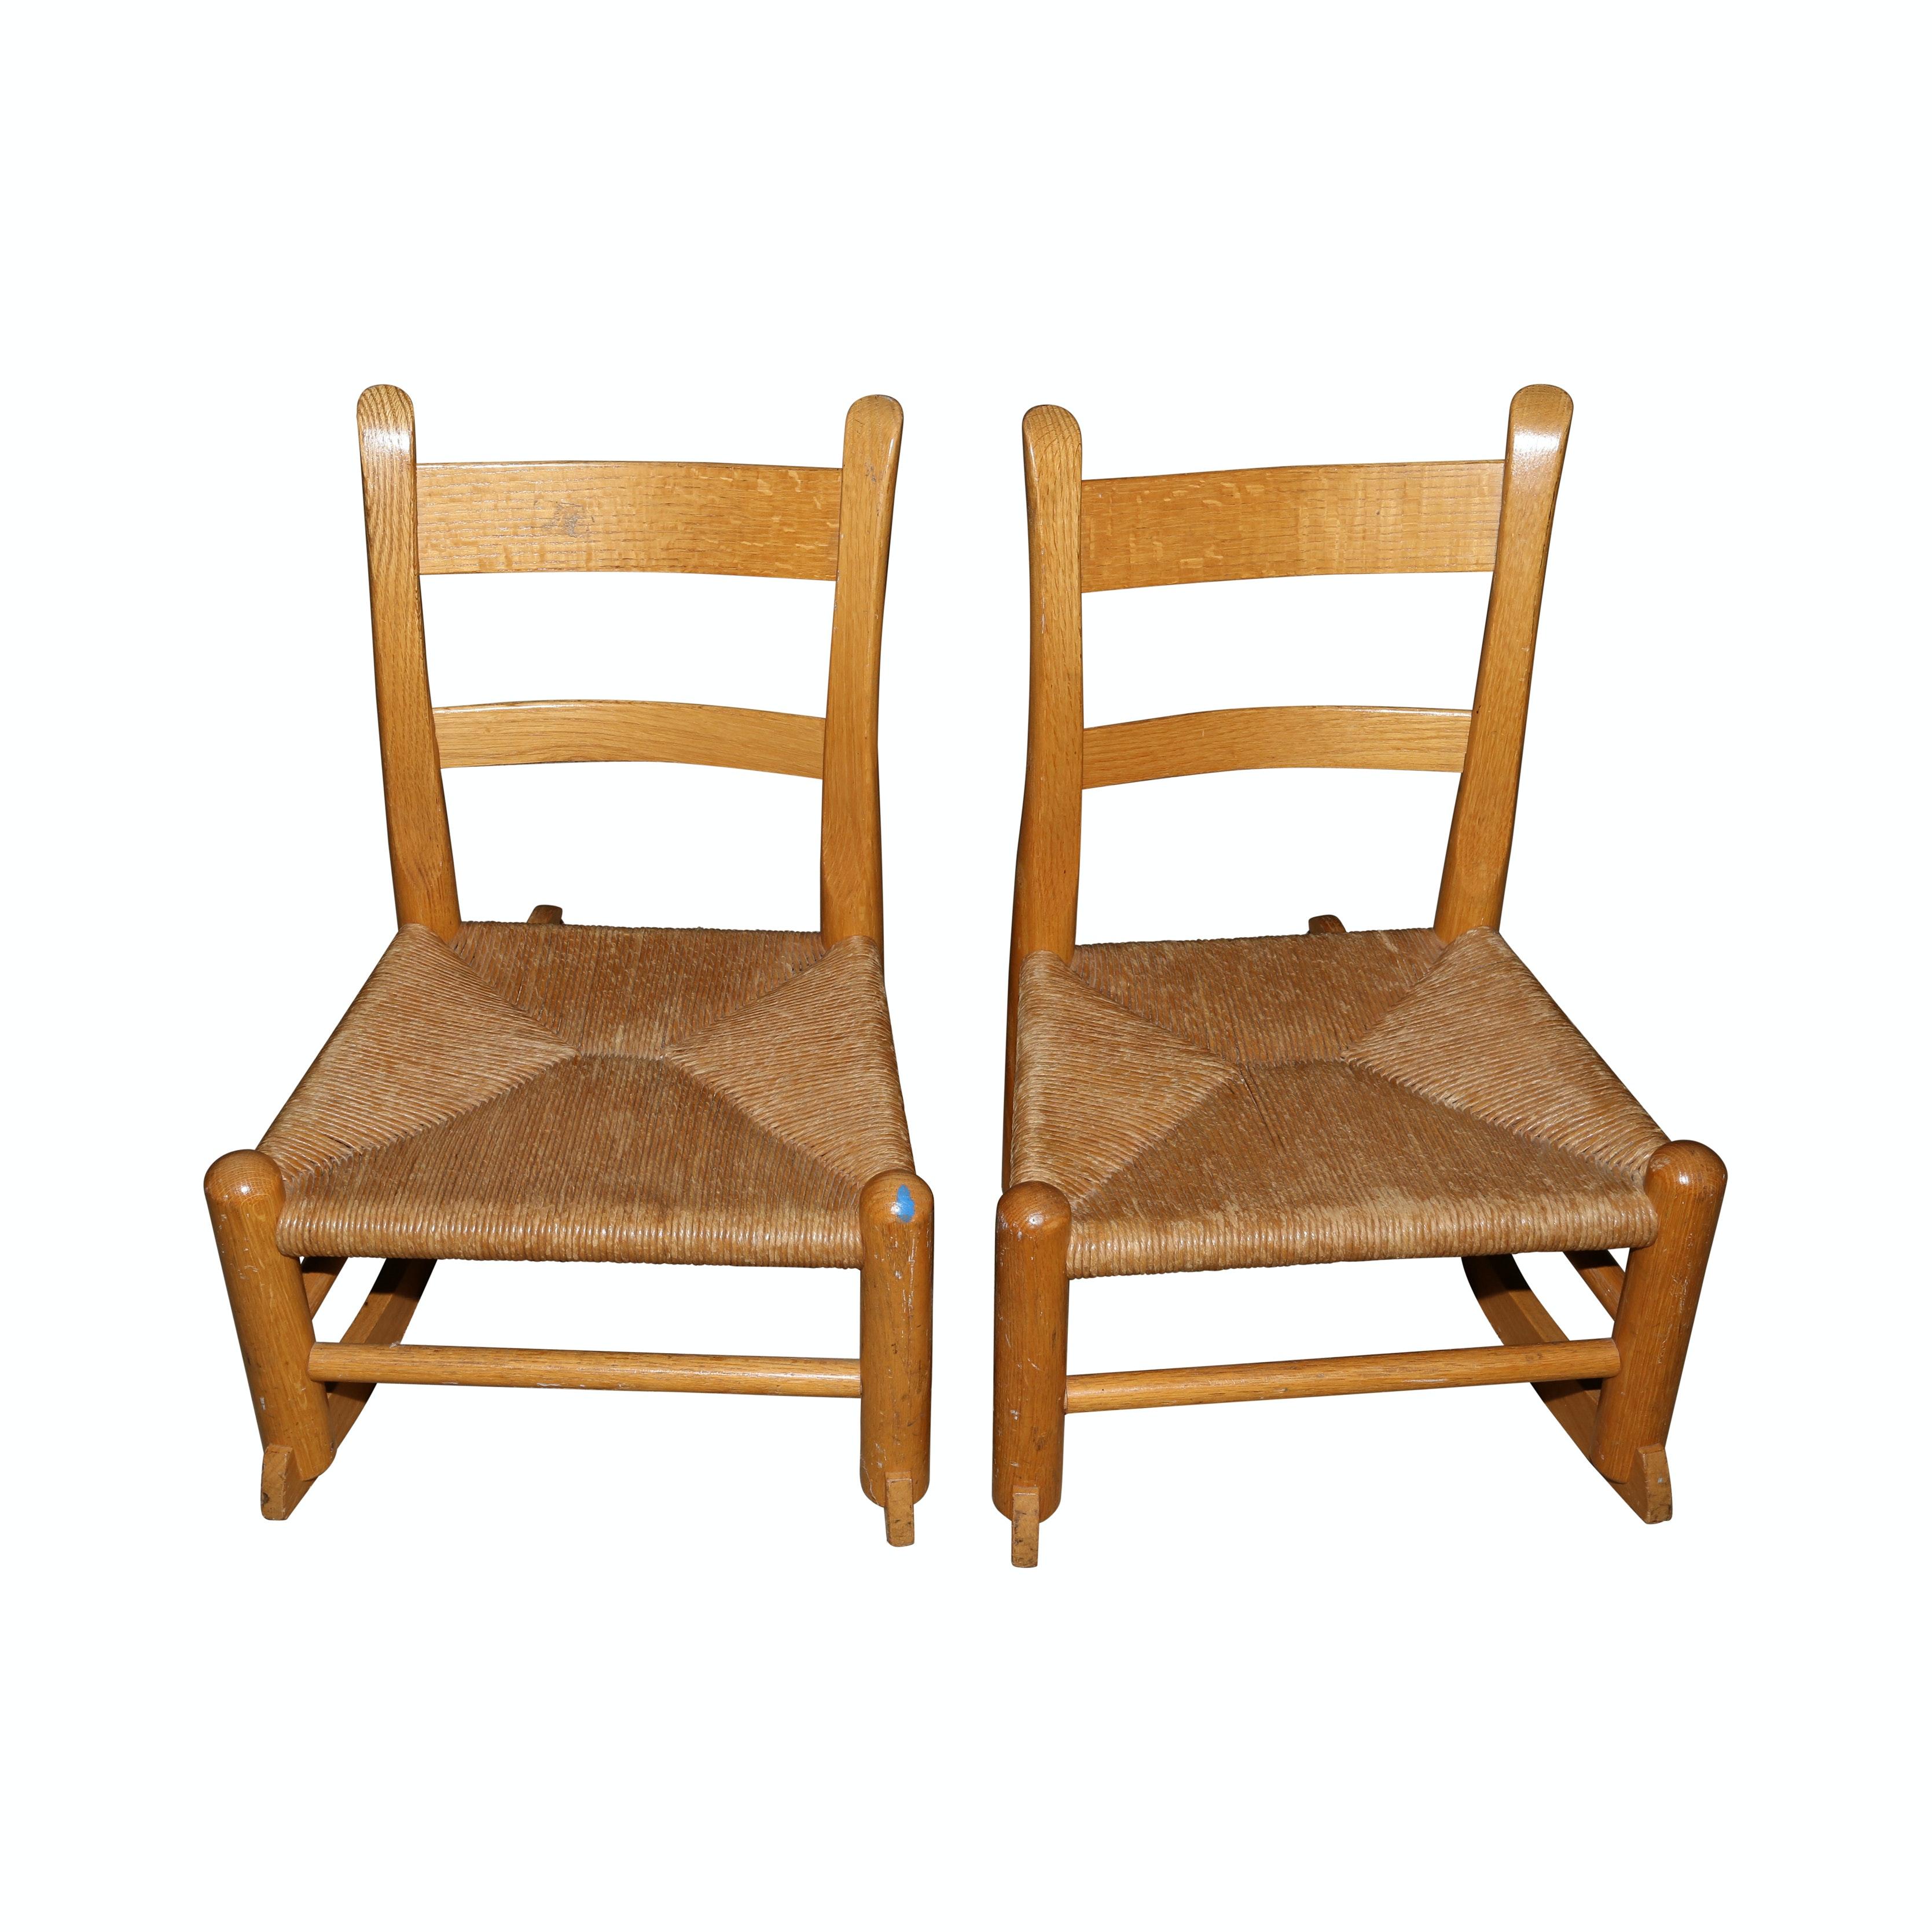 Child Size Rocking Chairs